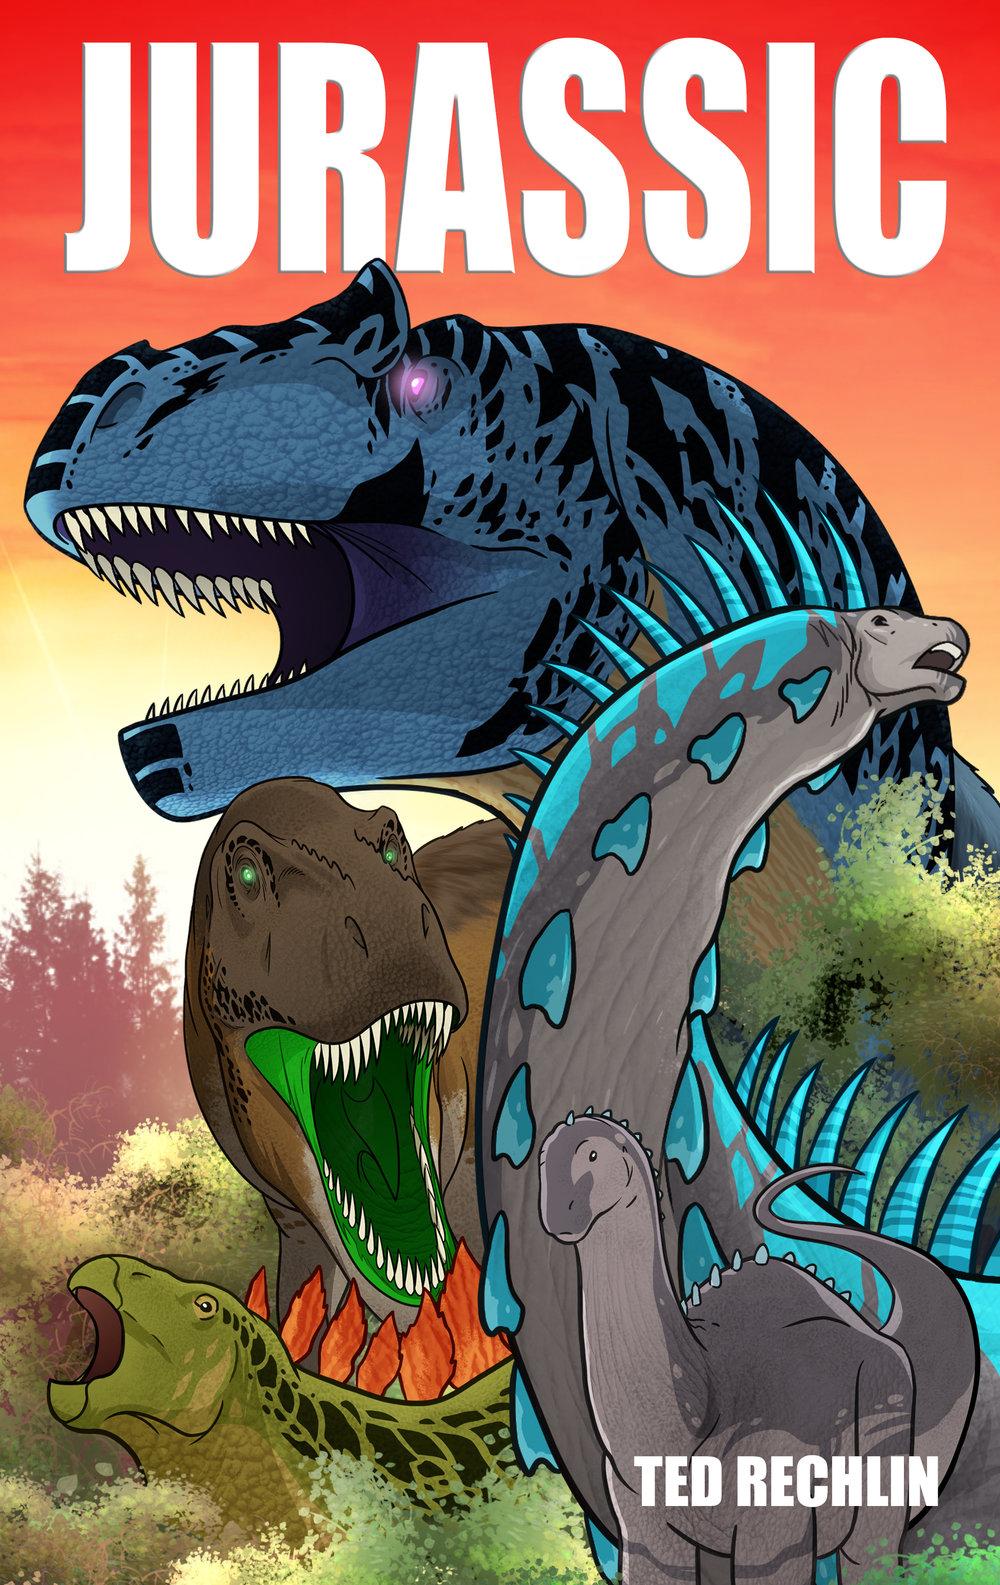 Jurassic_Cover_TedRechlin_RextoothStudios